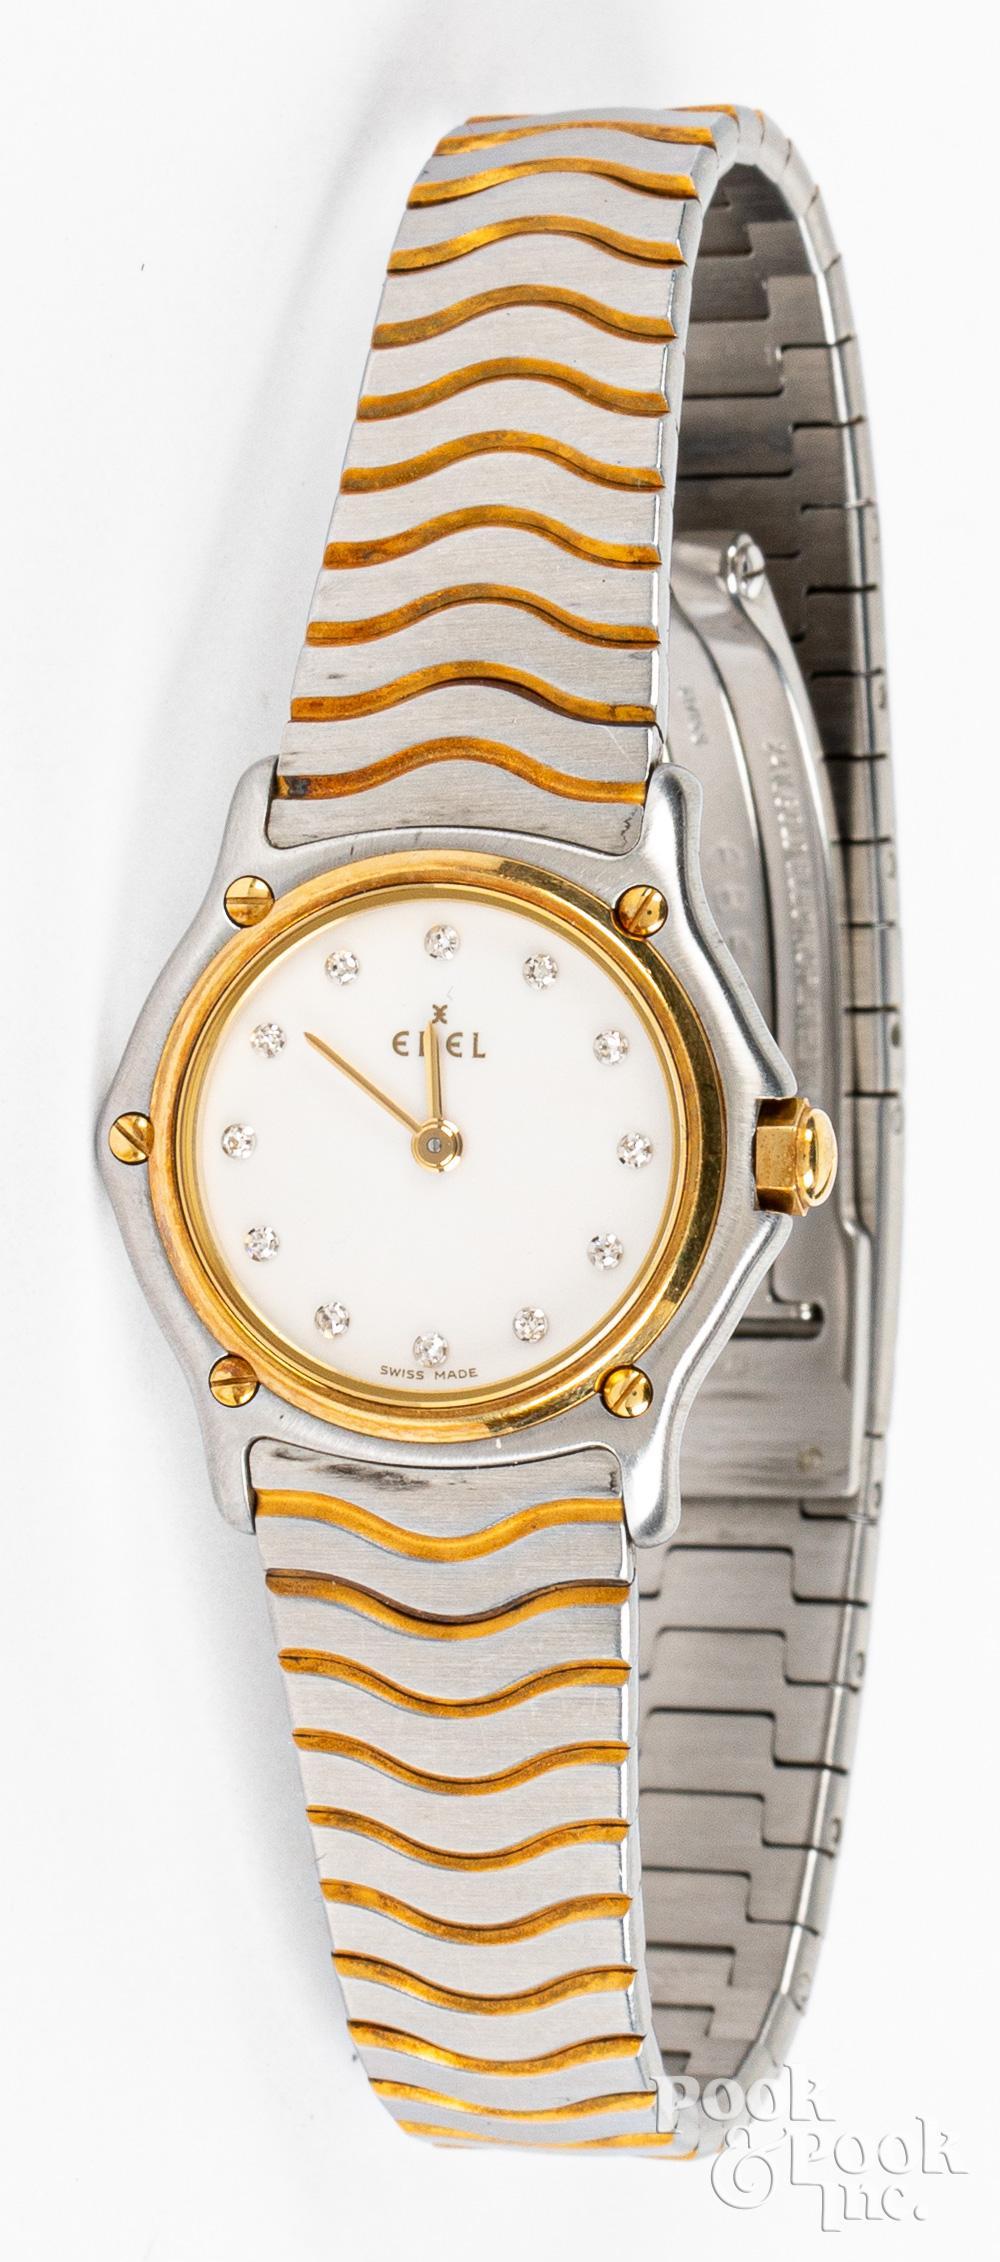 Ebel ladies wristwatch with 18K gold bezel.